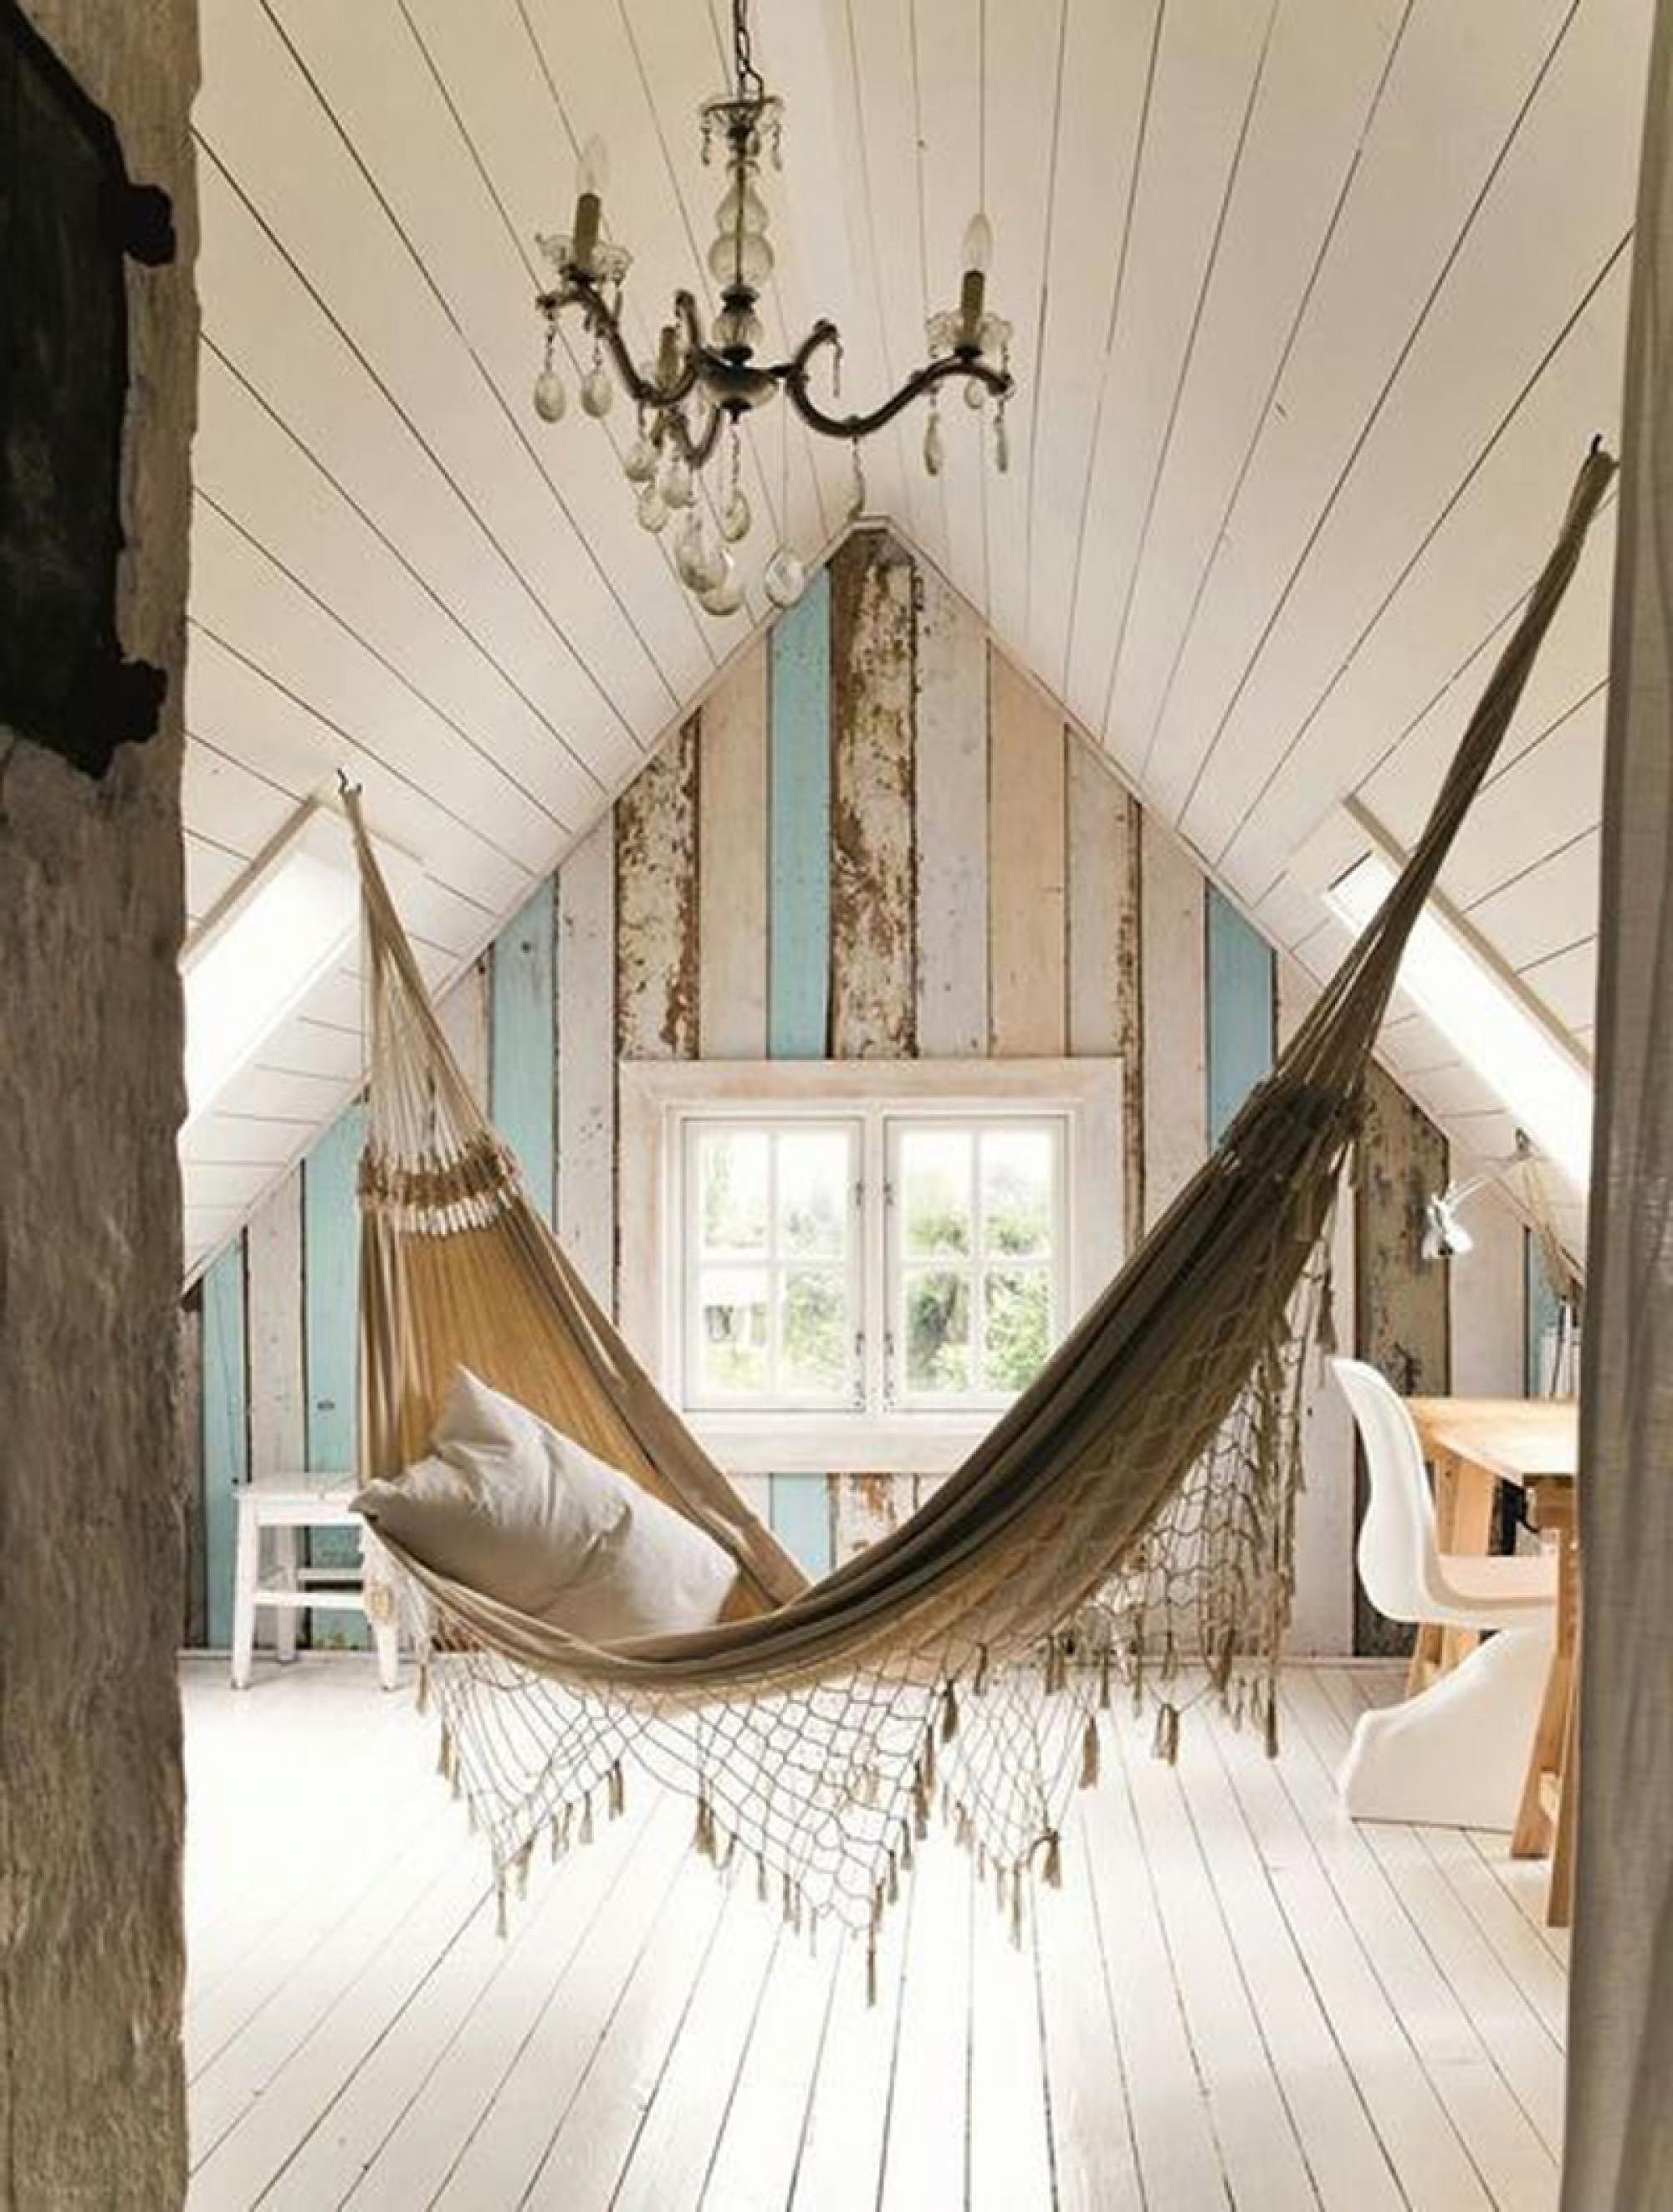 creative room decorating ideas with hammocks for interior